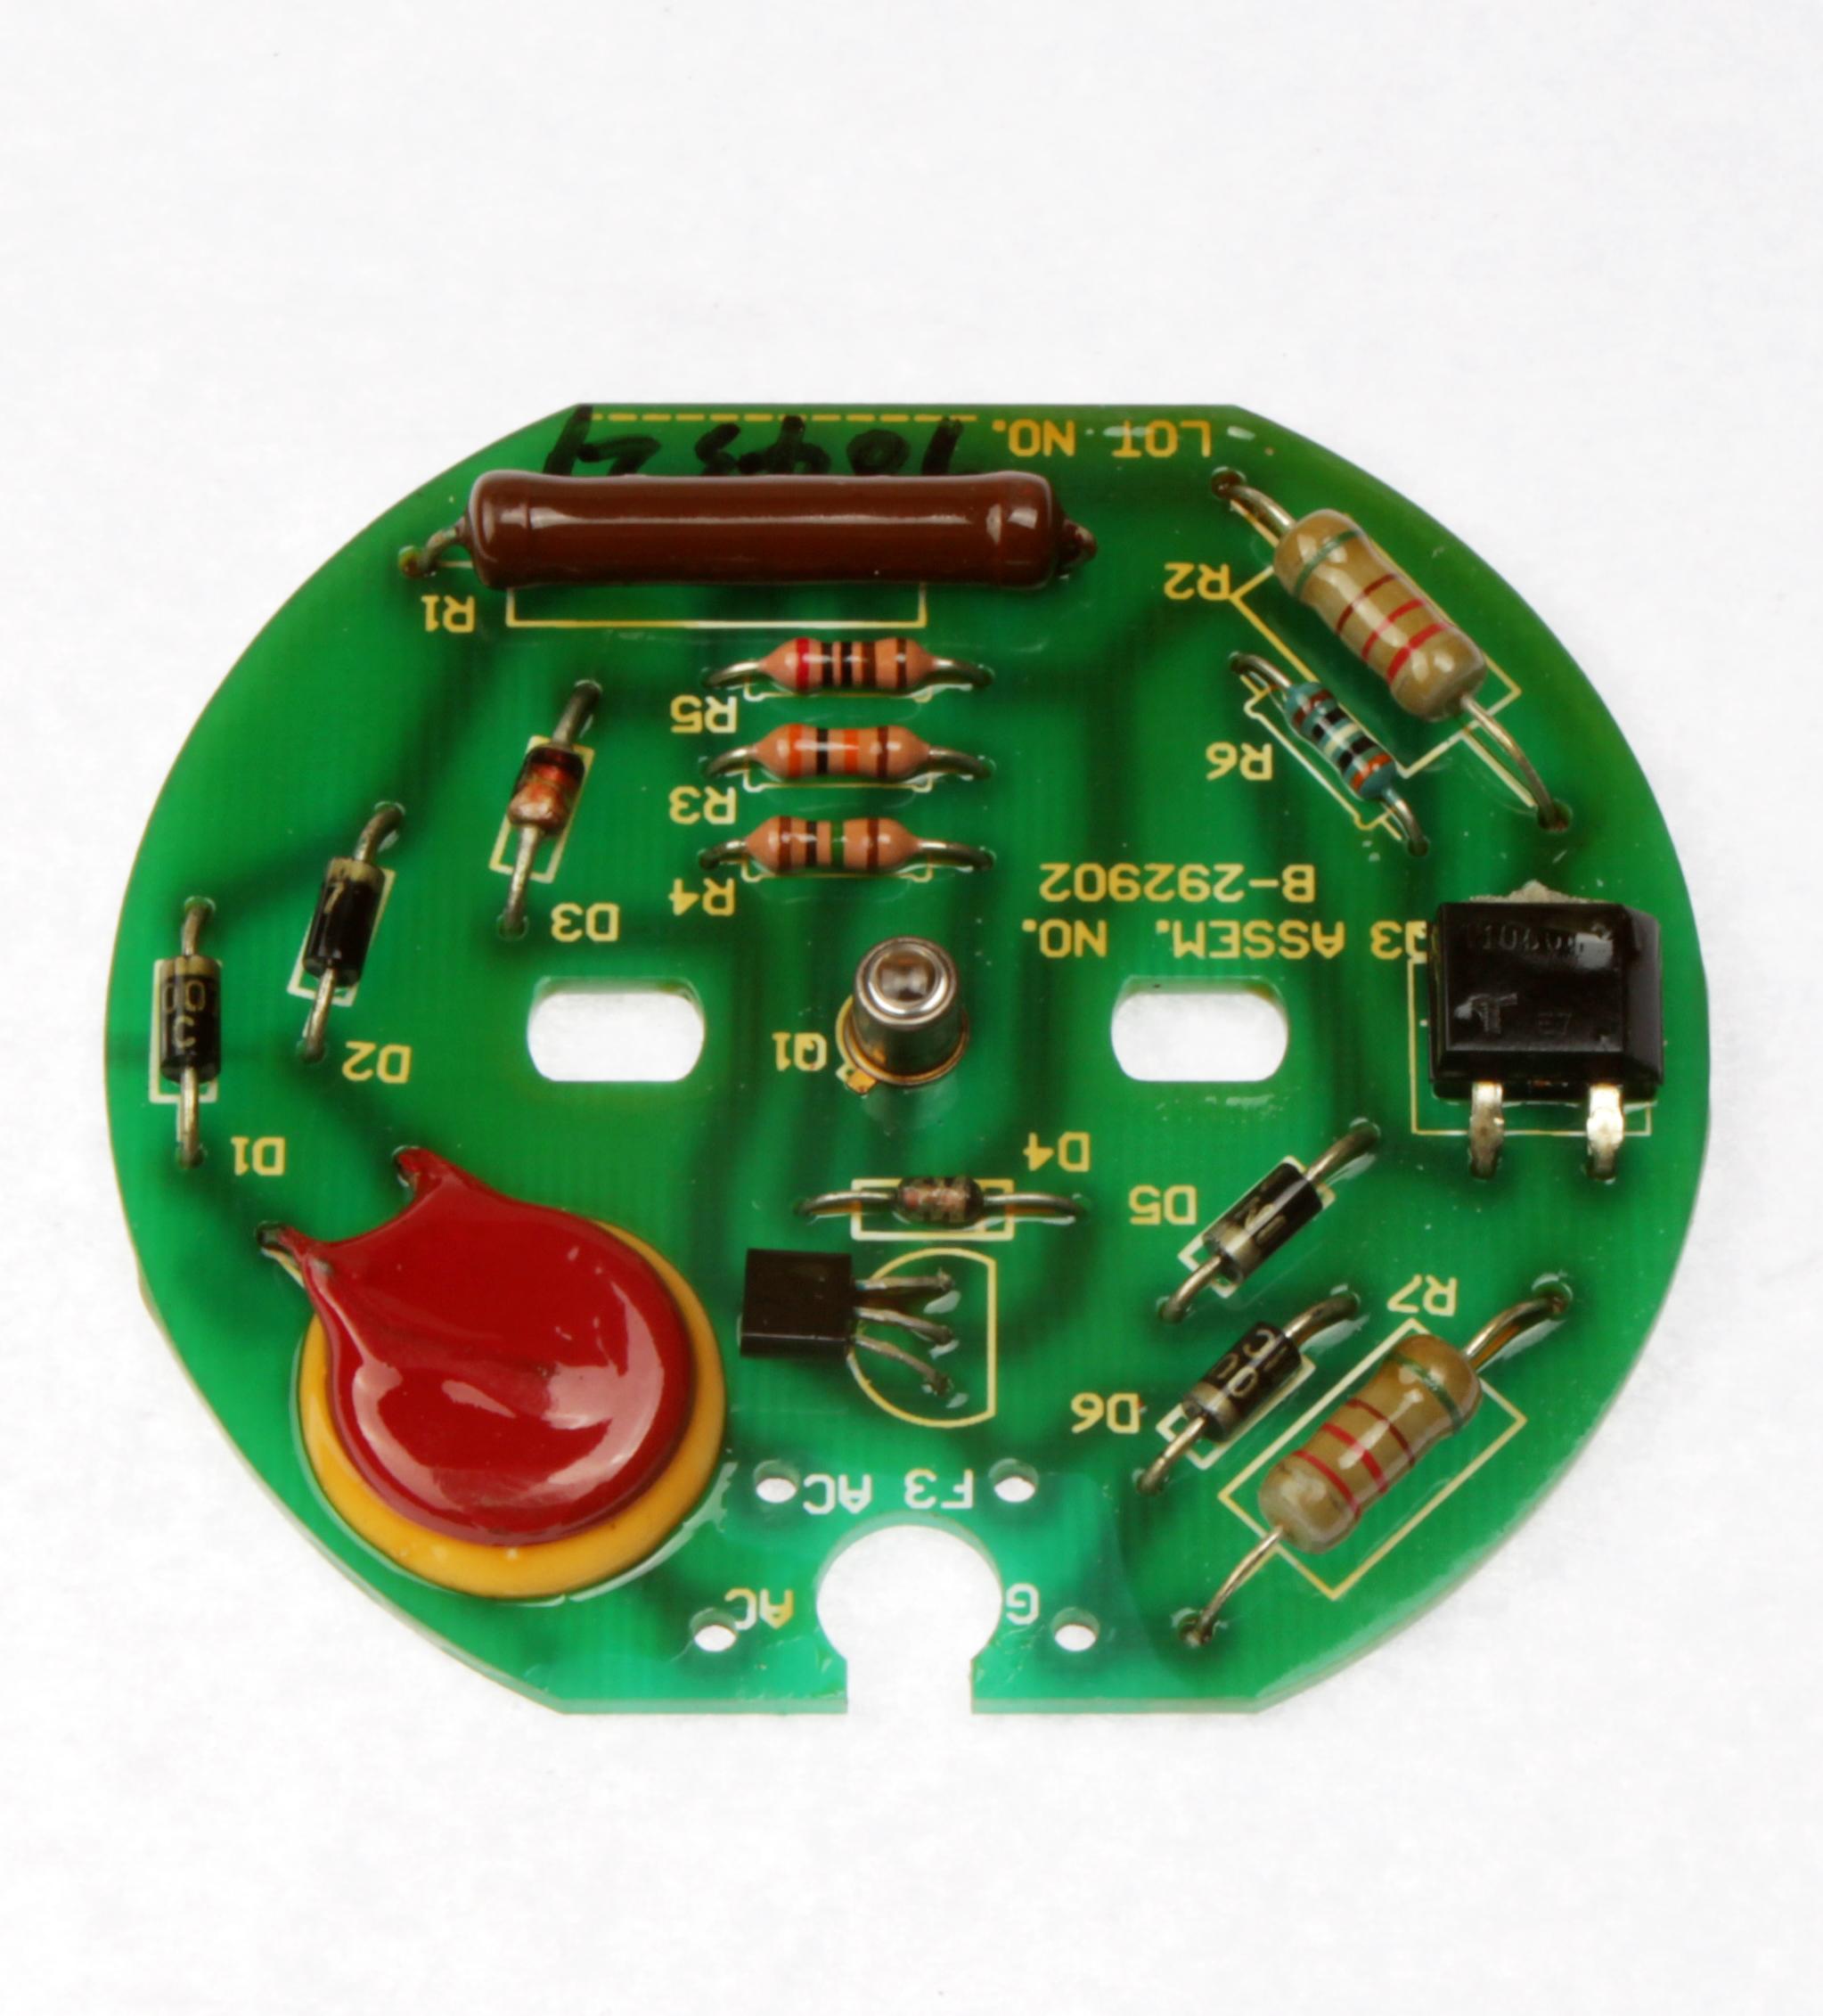 Circuit Boardpower Bank Circuit Boardoem Power Bank Circuit Board